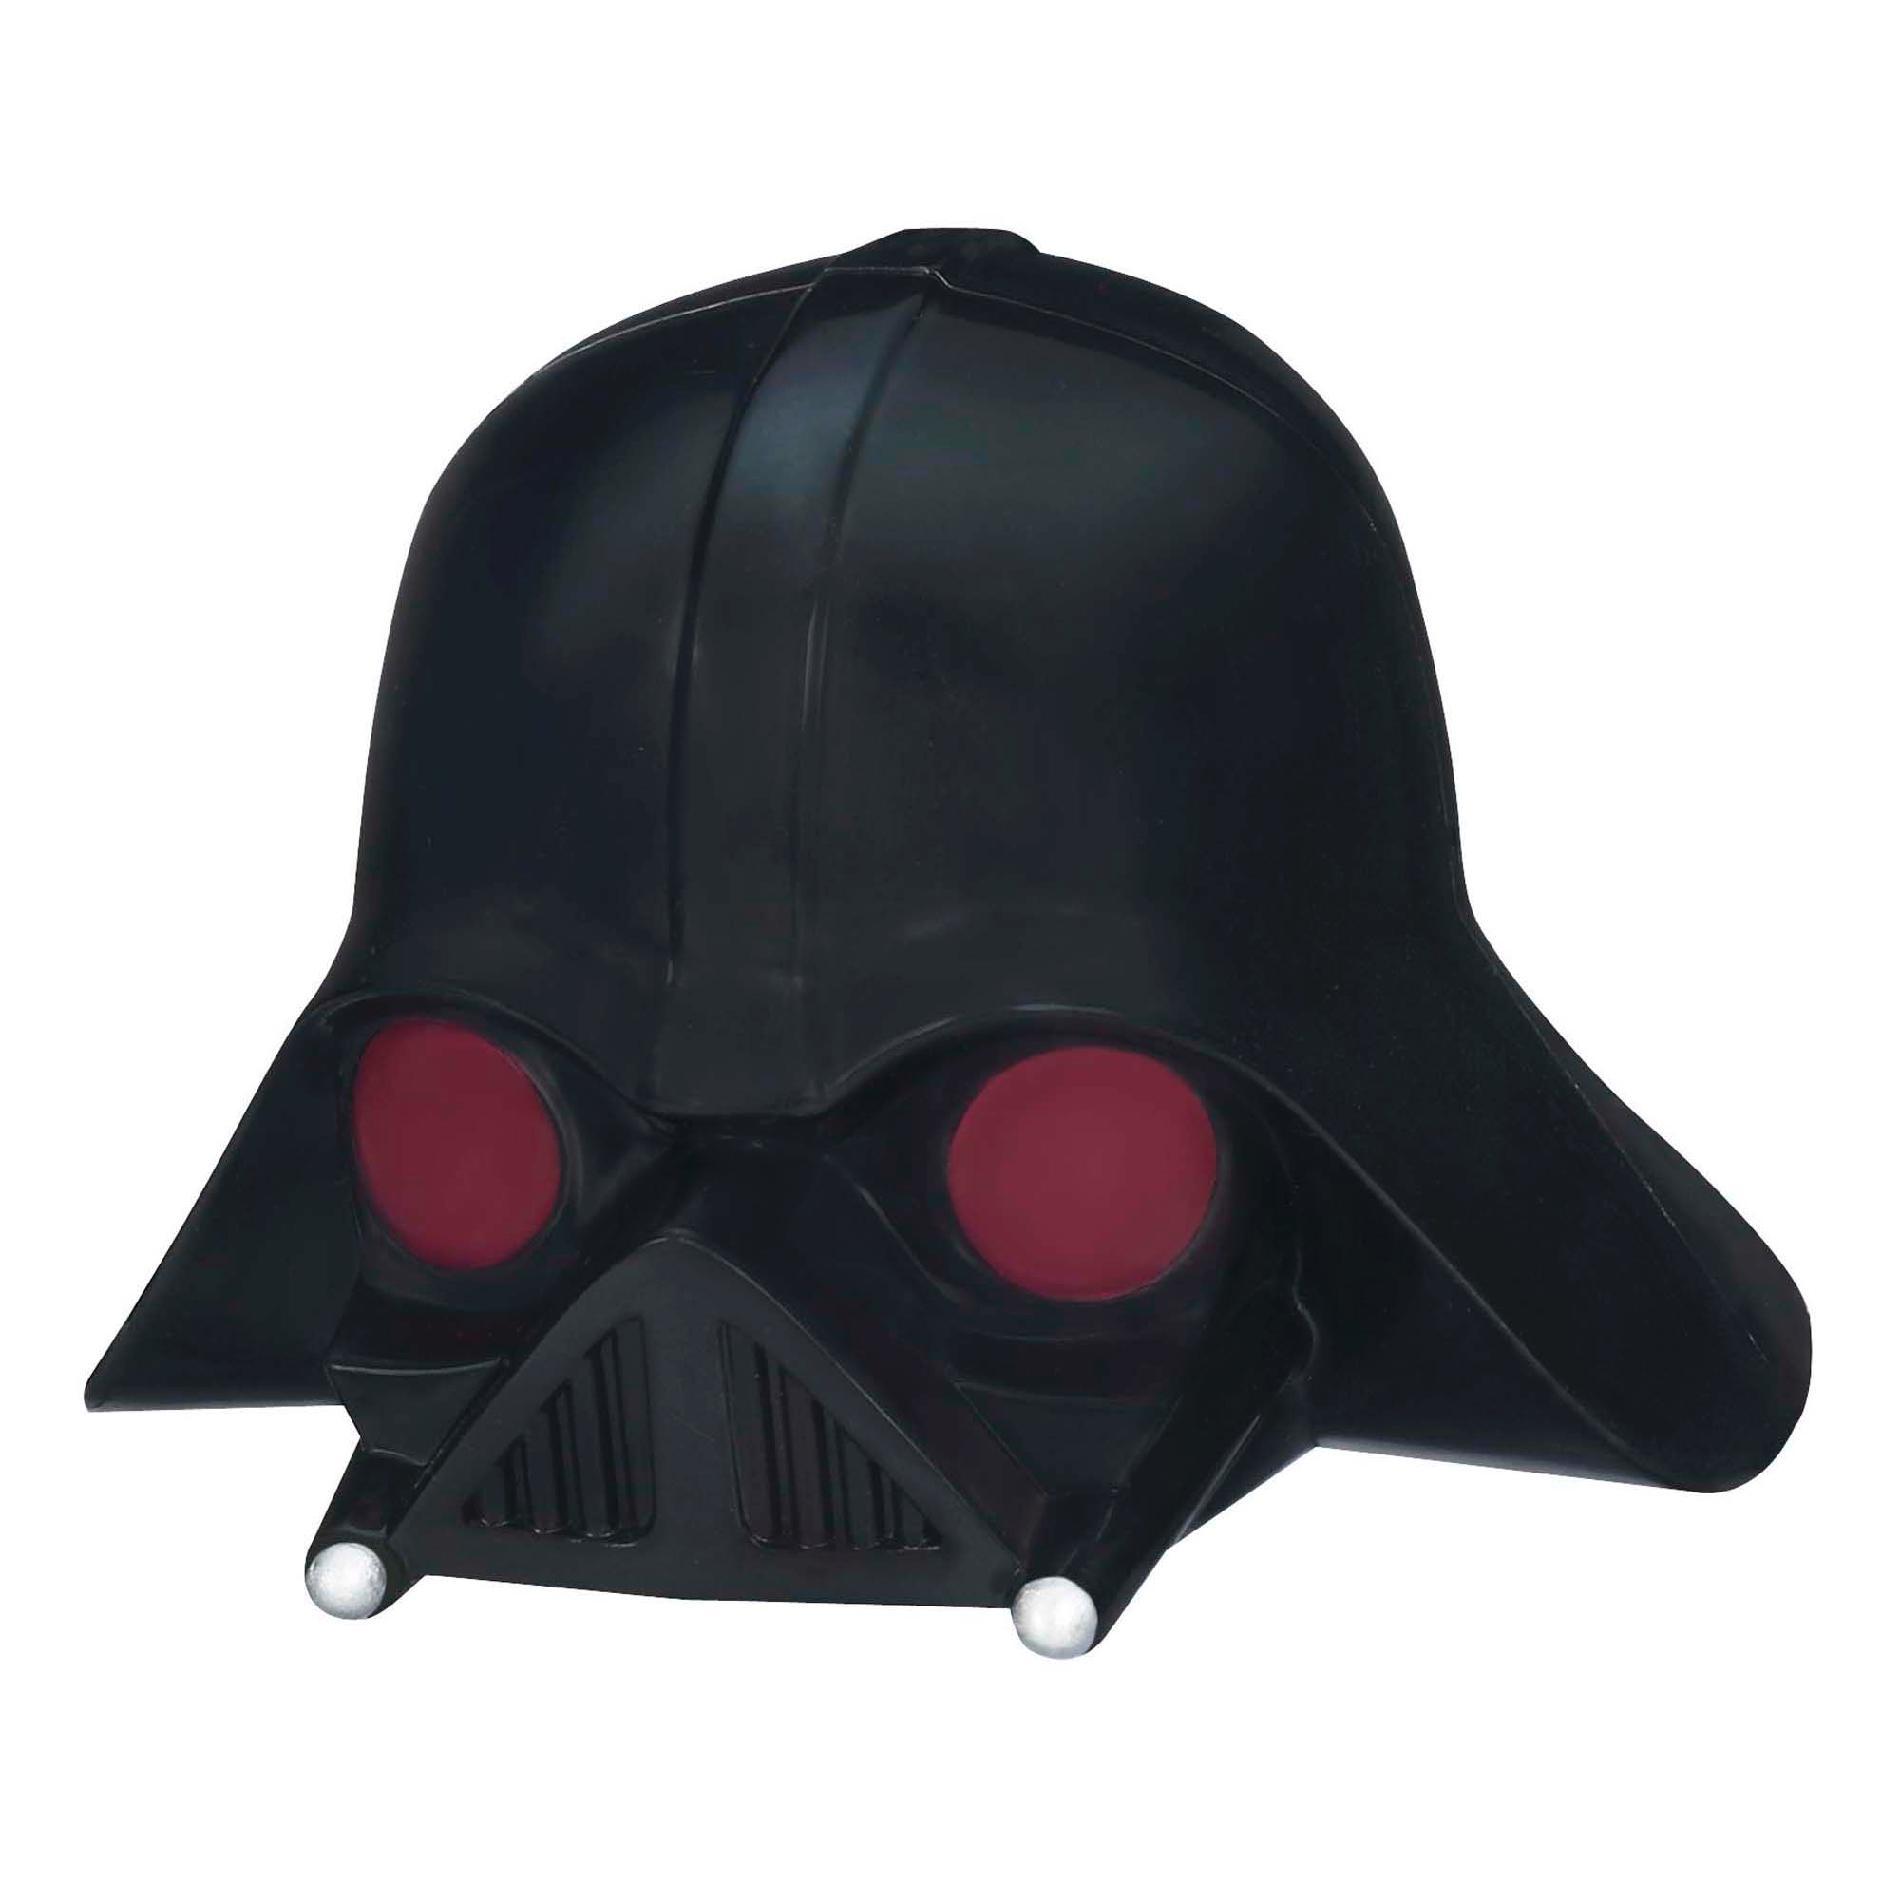 Star Wars Angry Birds Star Wars Power Battlers Darth Vader Pig Battler PartNumber: 004W005792418001P